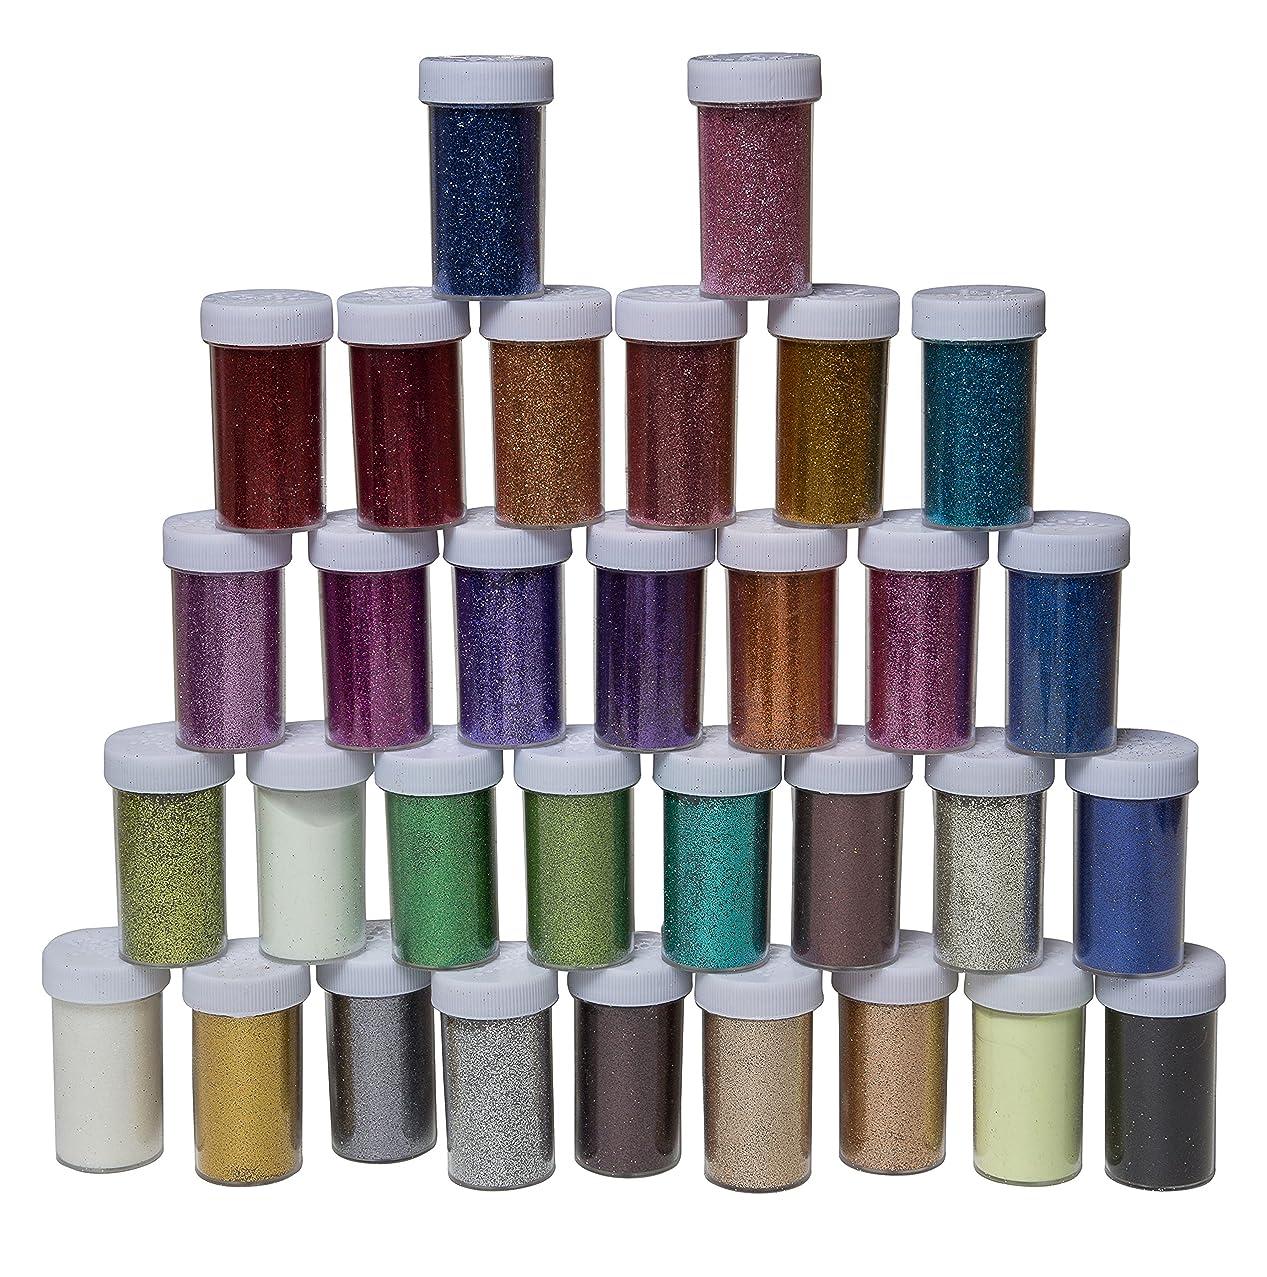 32 Pack Multi-Coloured Glitter Included 2 Glow-in-The-Dark Glitters